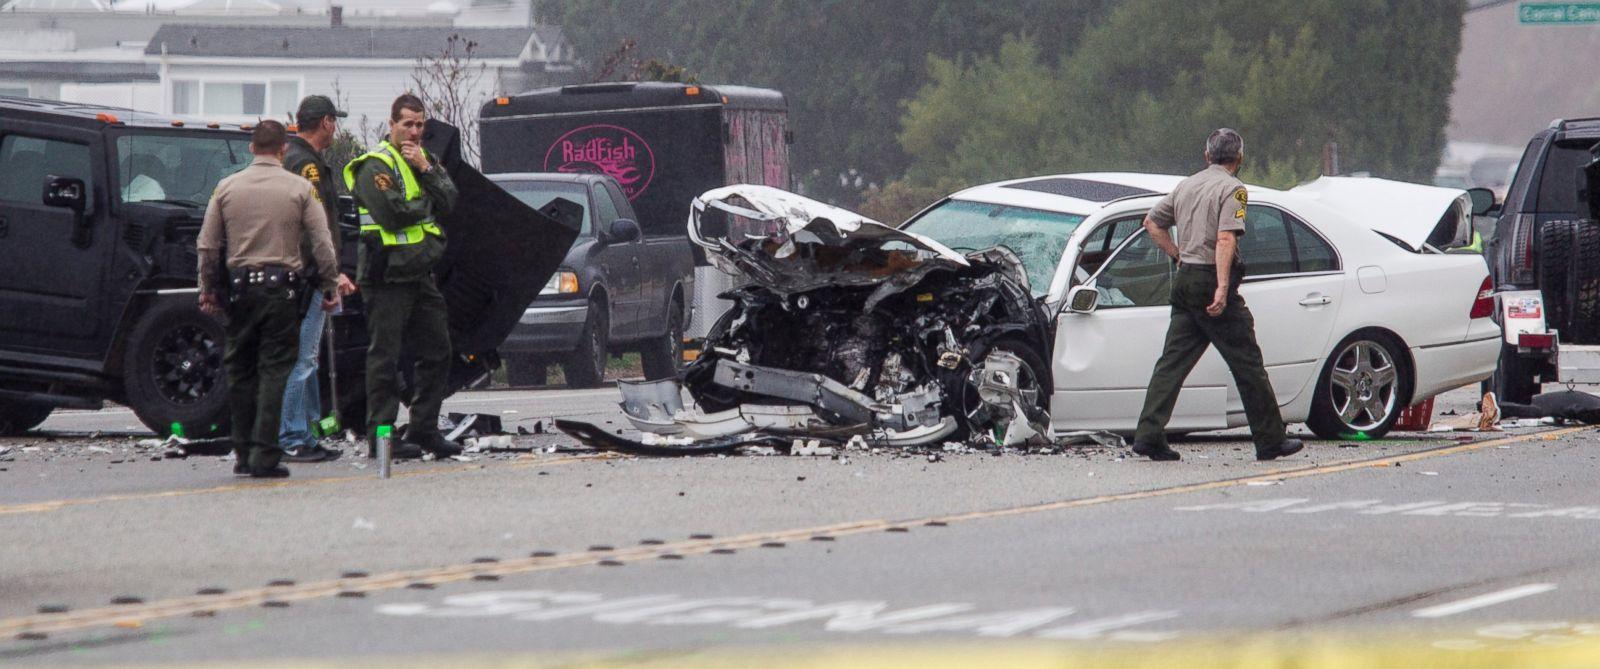 PHOTO: Los Angeles County Sheriffs deputies investigate the scene of a collision involving three vehicles in Malibu, Calif. on Saturday, Feb. 7, 2015.